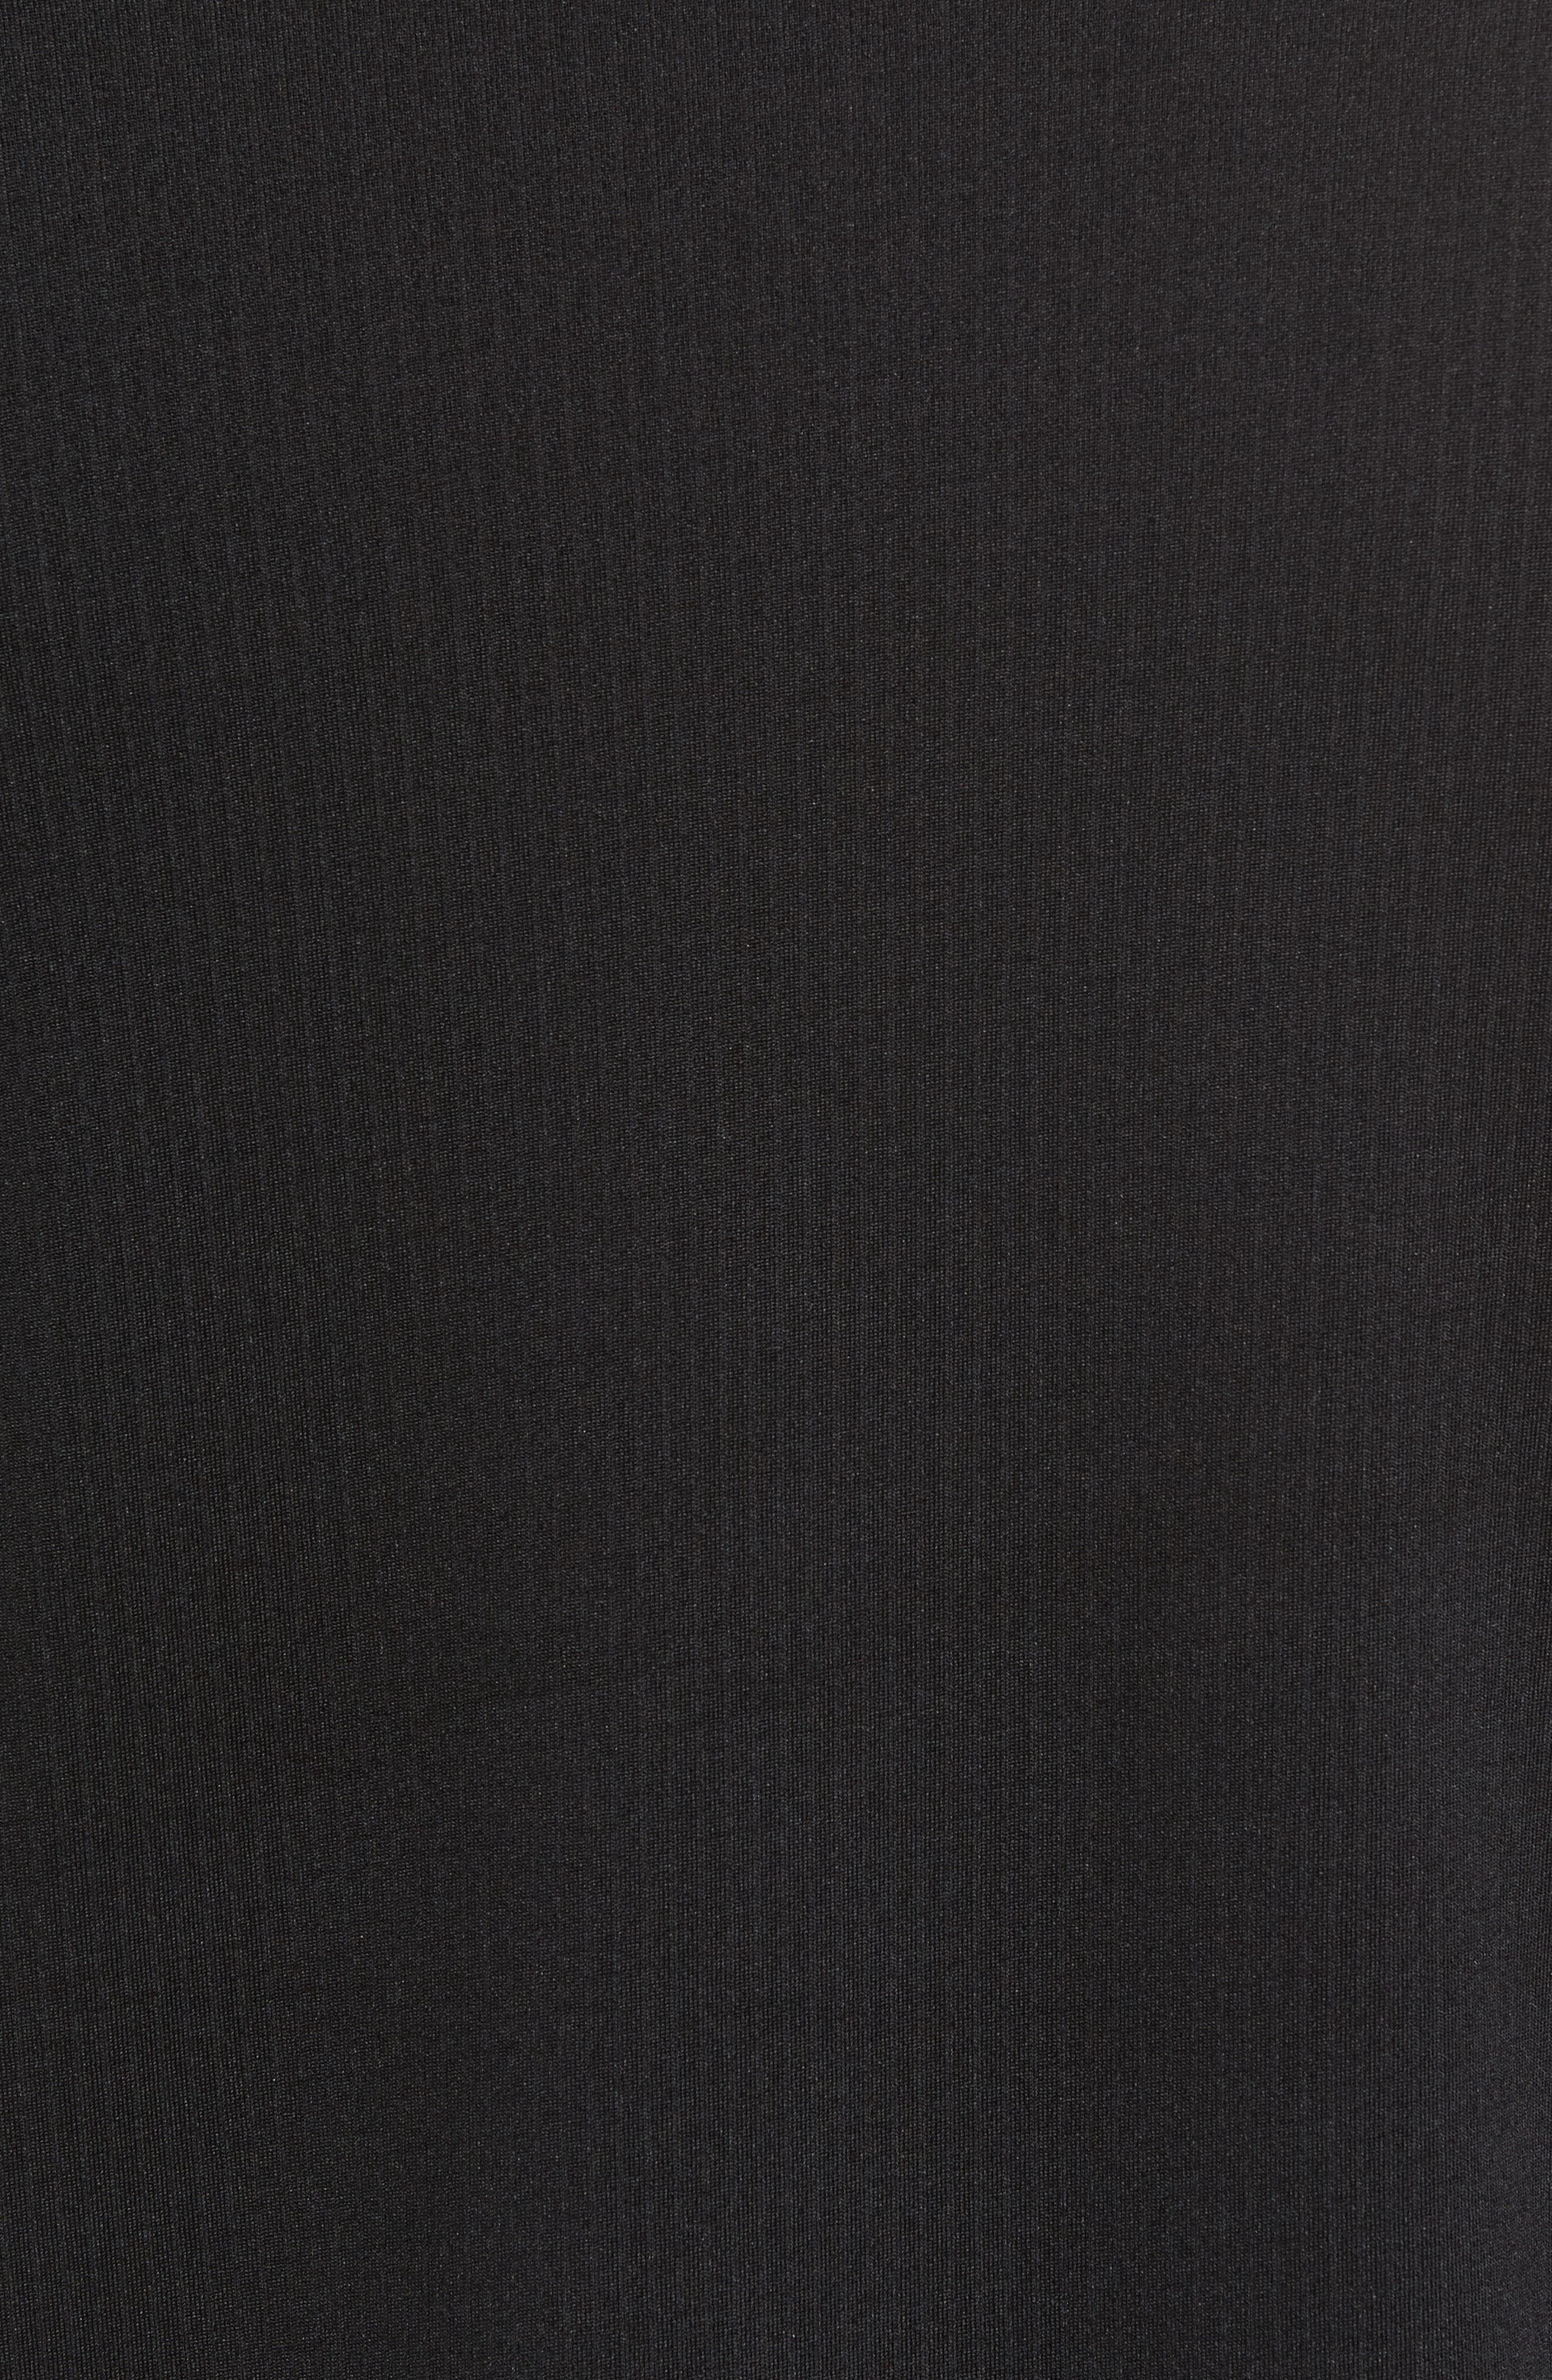 Capilene Midweight Base Layer T-Shirt,                             Alternate thumbnail 5, color,                             001